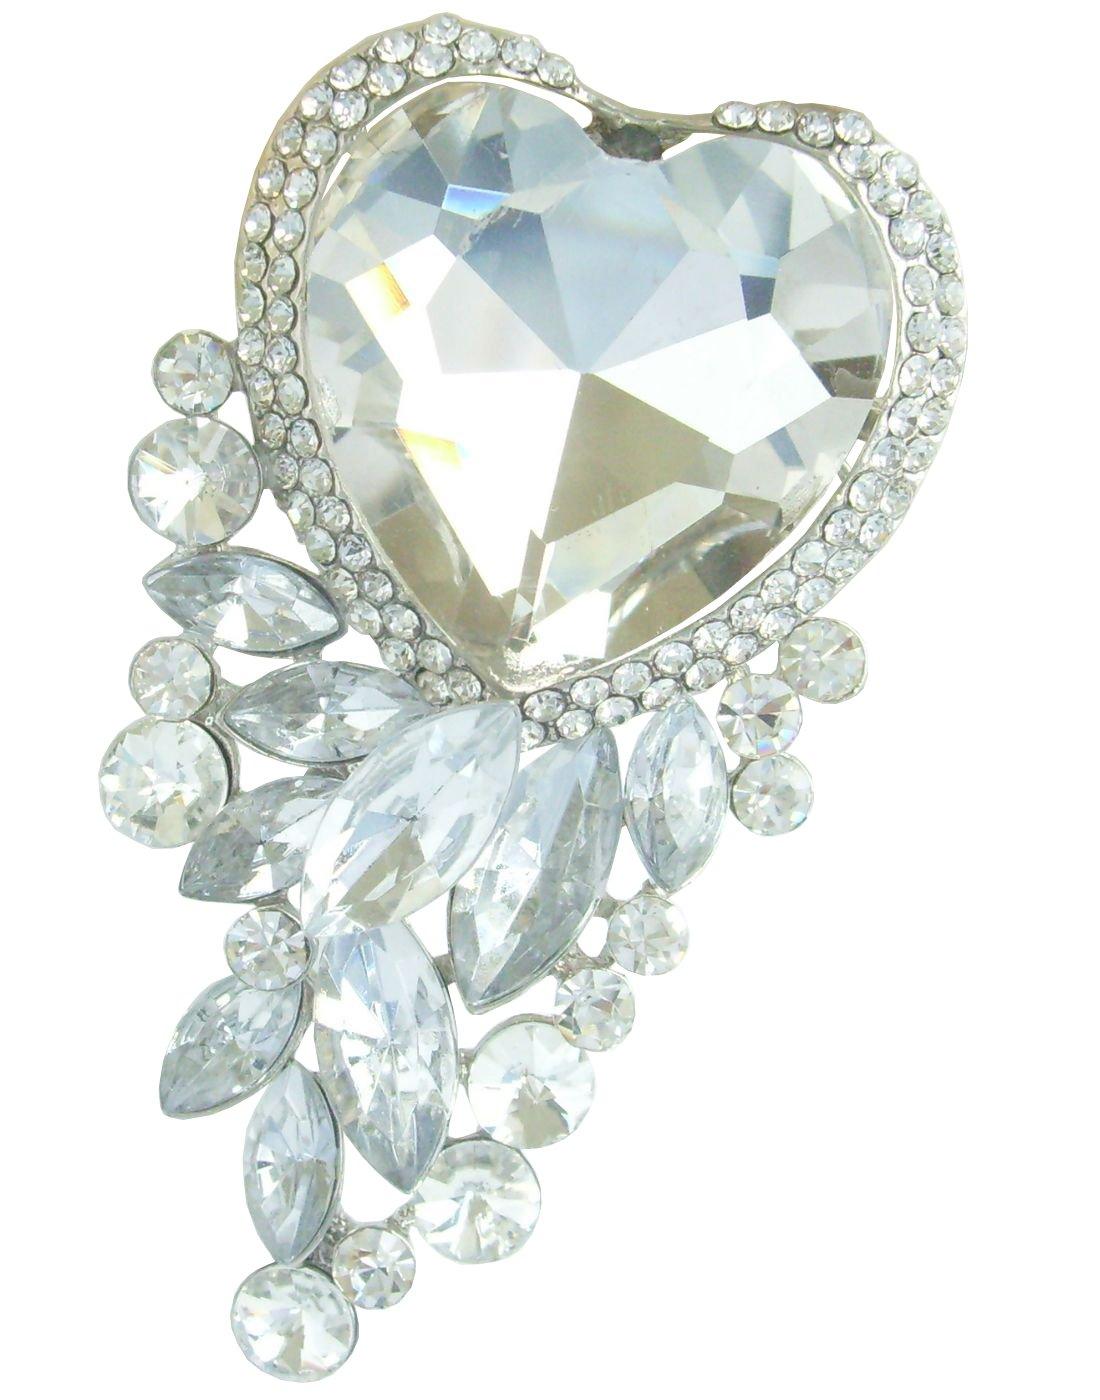 Sindary Wedding 2.56'' Rhinestone Crystal Love Heart Flower Brooch Pin Pendant BZ2079 (Silver-Tone Clear)